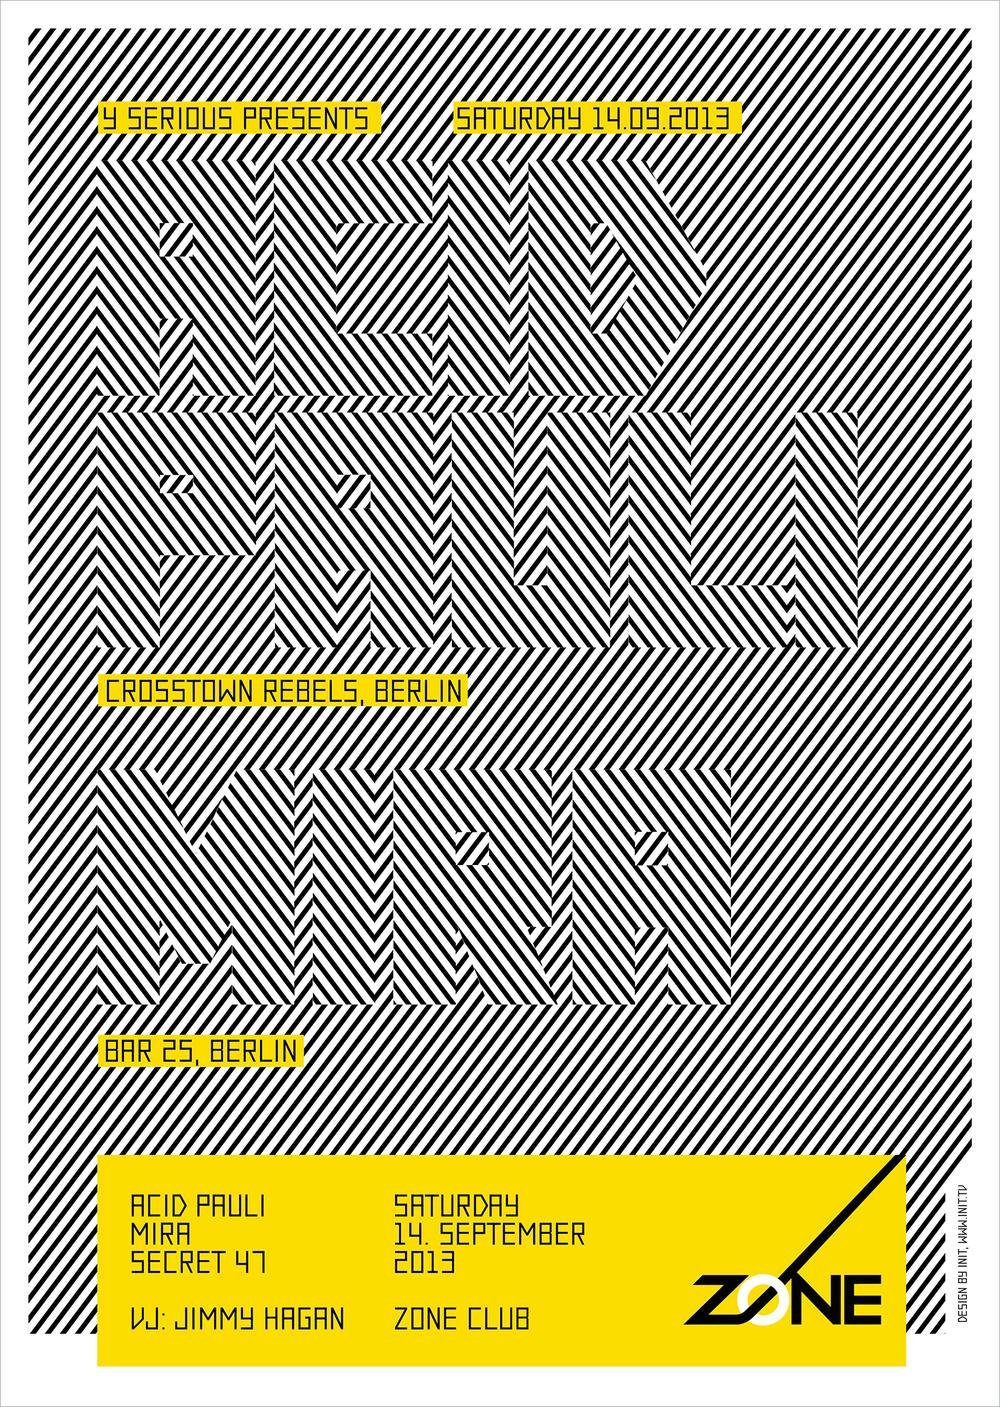 poster_acidpauliB2sm copy.jpg